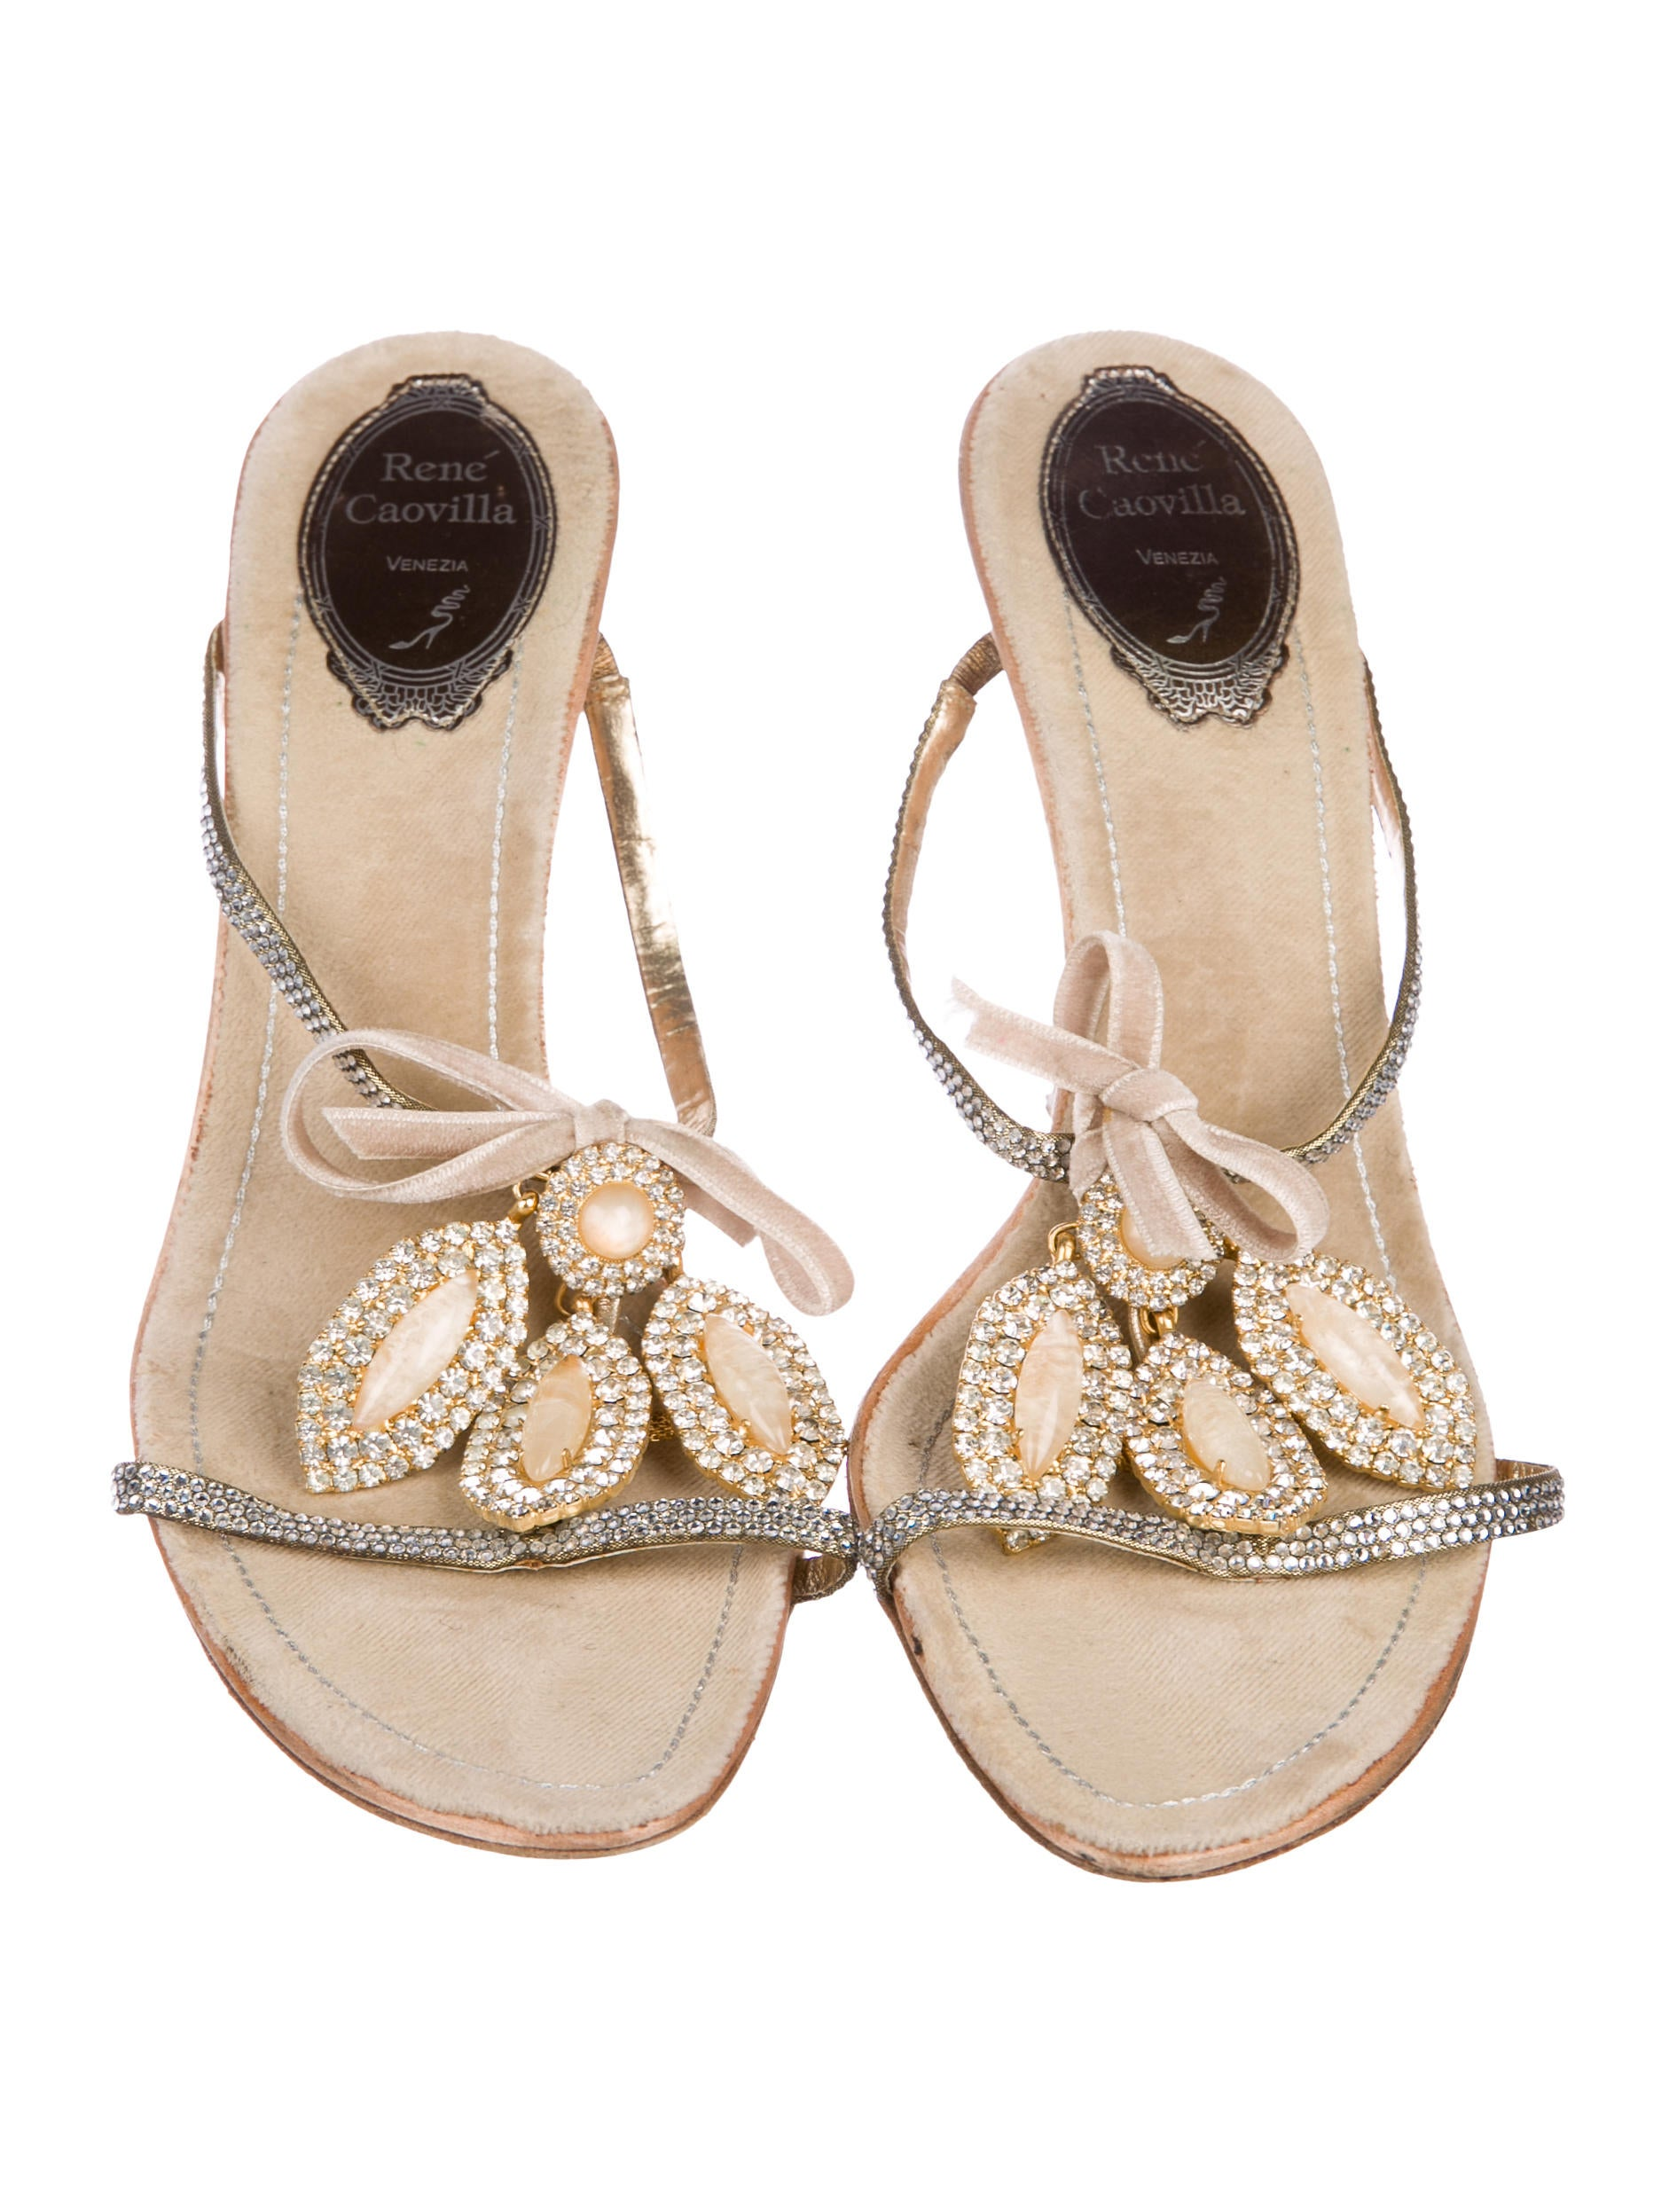 René Caovilla Rene Caovilla Embellished Bow-Adorned Sandals clearance manchester great sale 4JW54Sm